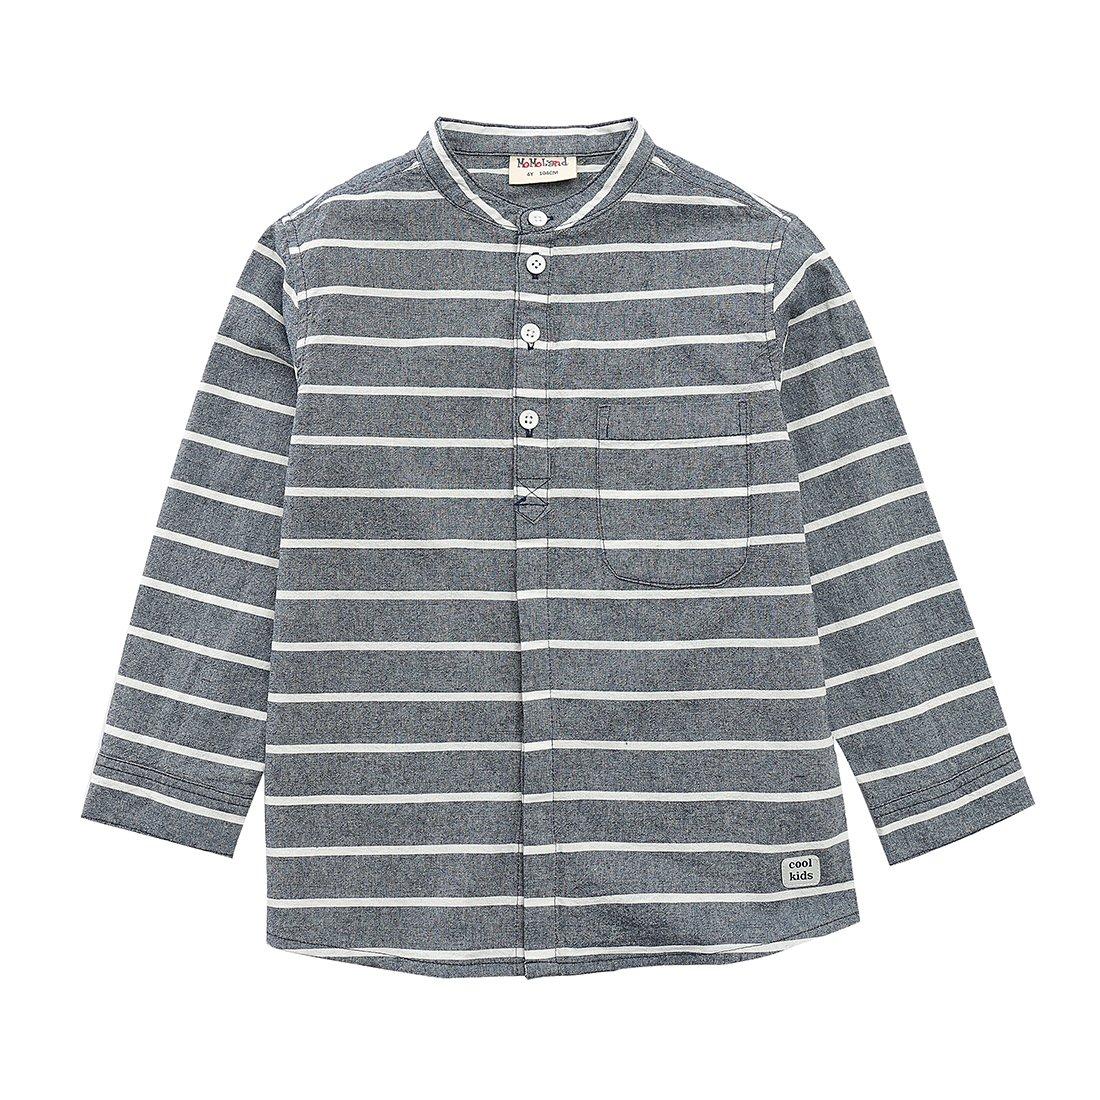 MOMOLAND Big Boys Long Sleeve Woven Striped Shirts Grey